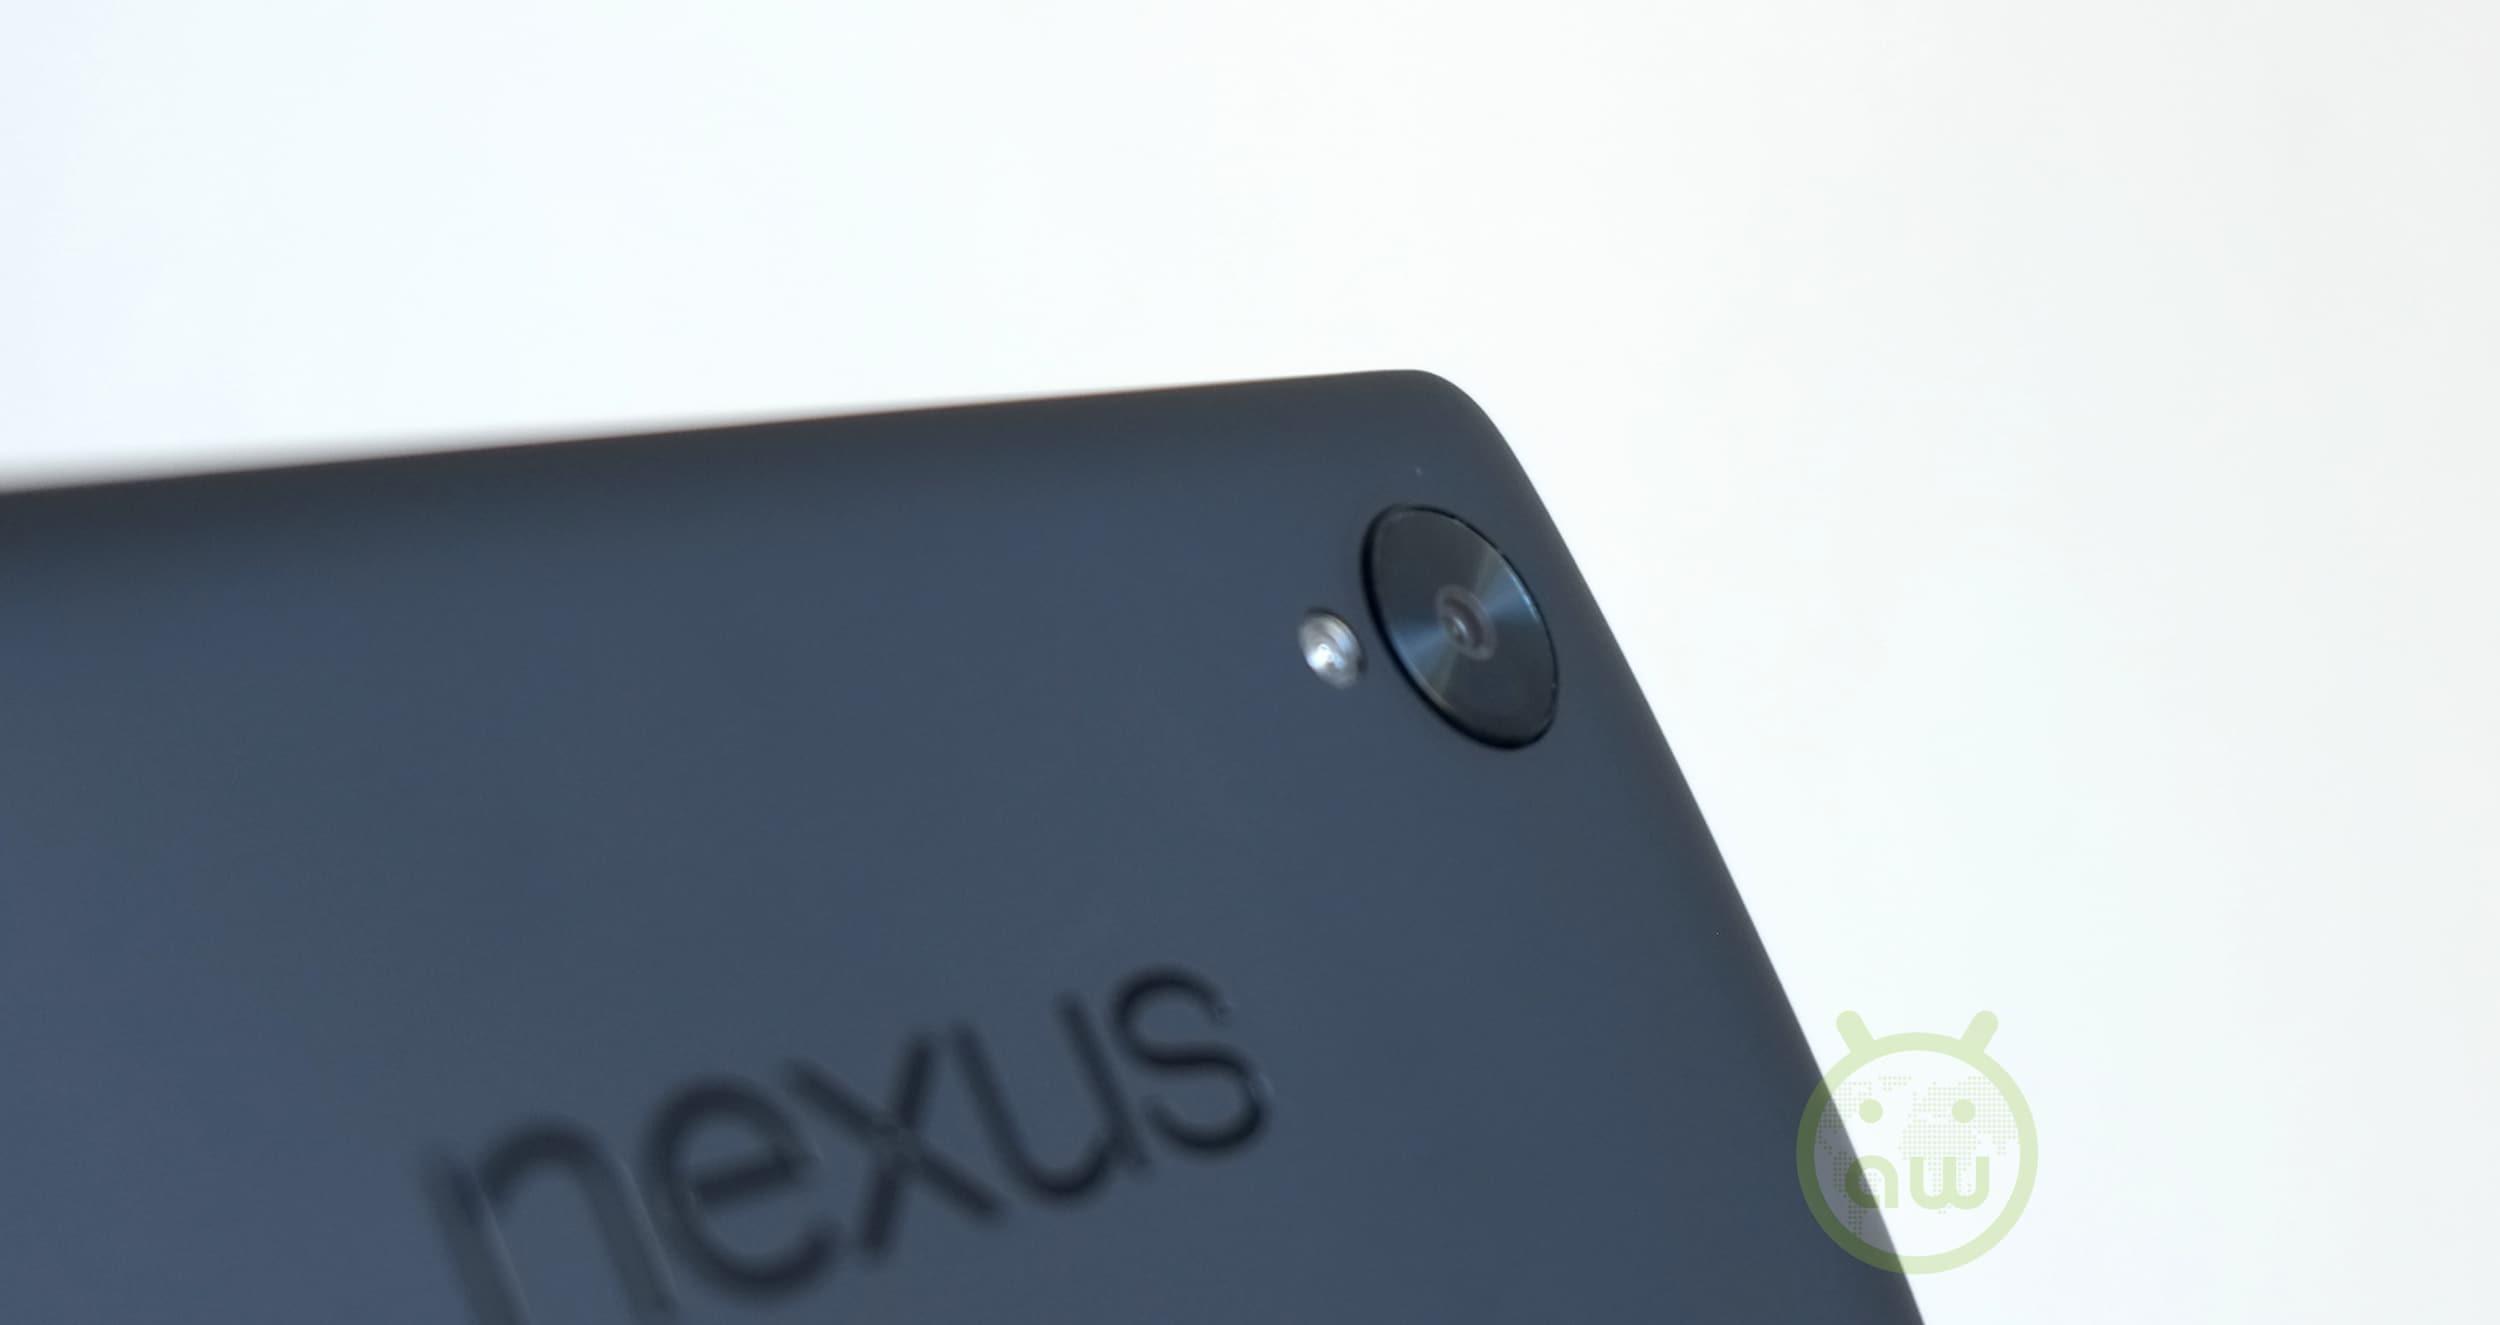 nexus 5 xda tutorial di sviluppo Android - nikomulis cf